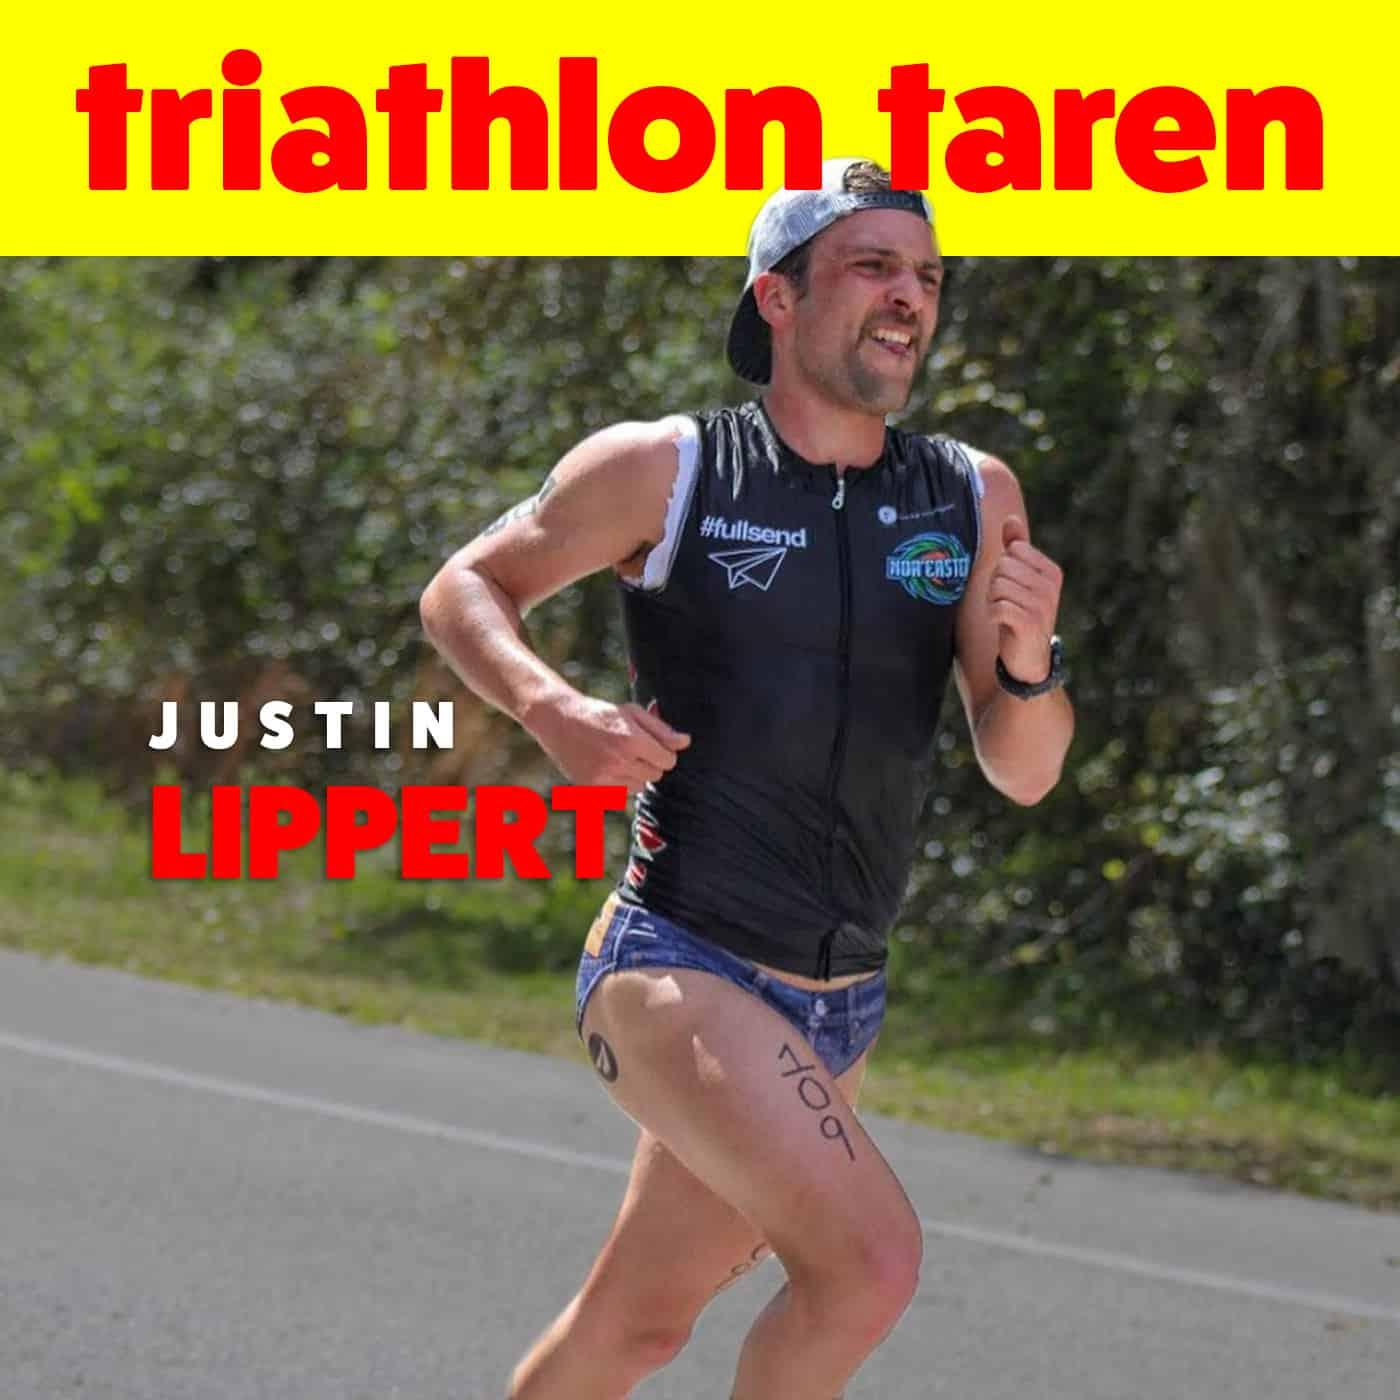 Winning triathlons at every distance | Justin Lippert